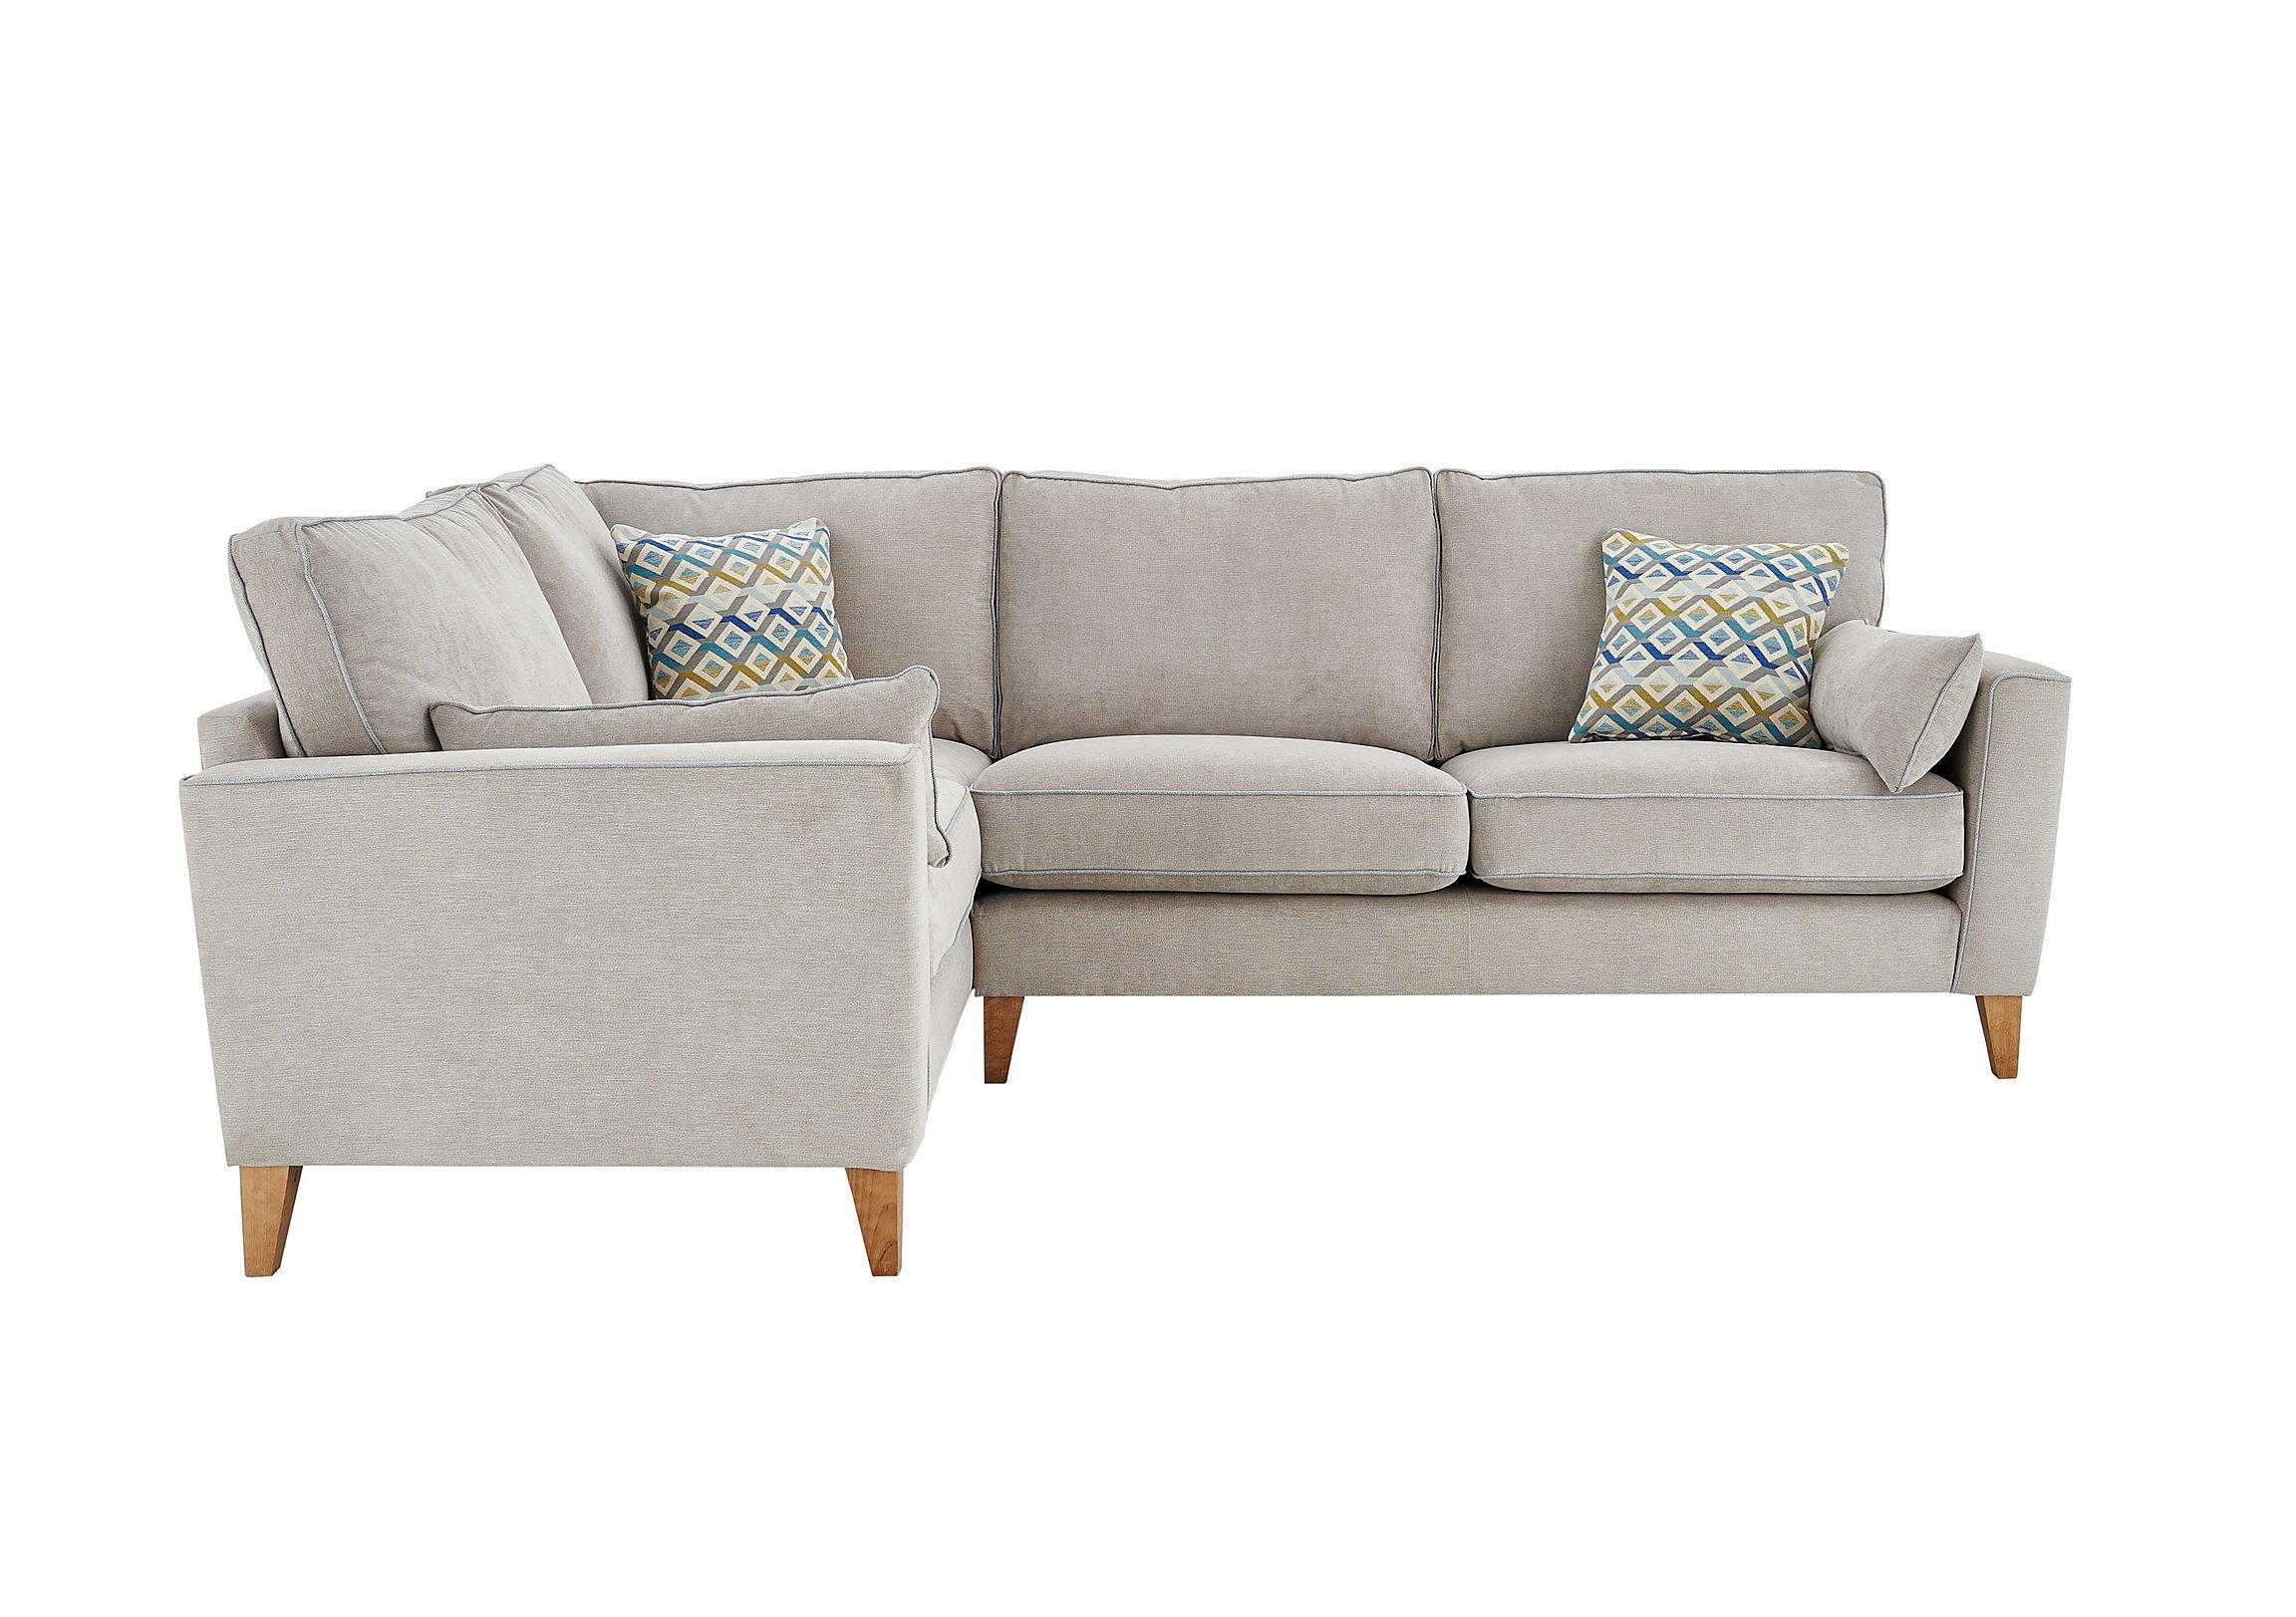 Marks Spencer Bedroom Furniture Copenhagen Fabric Corner Sofa Furniture Village